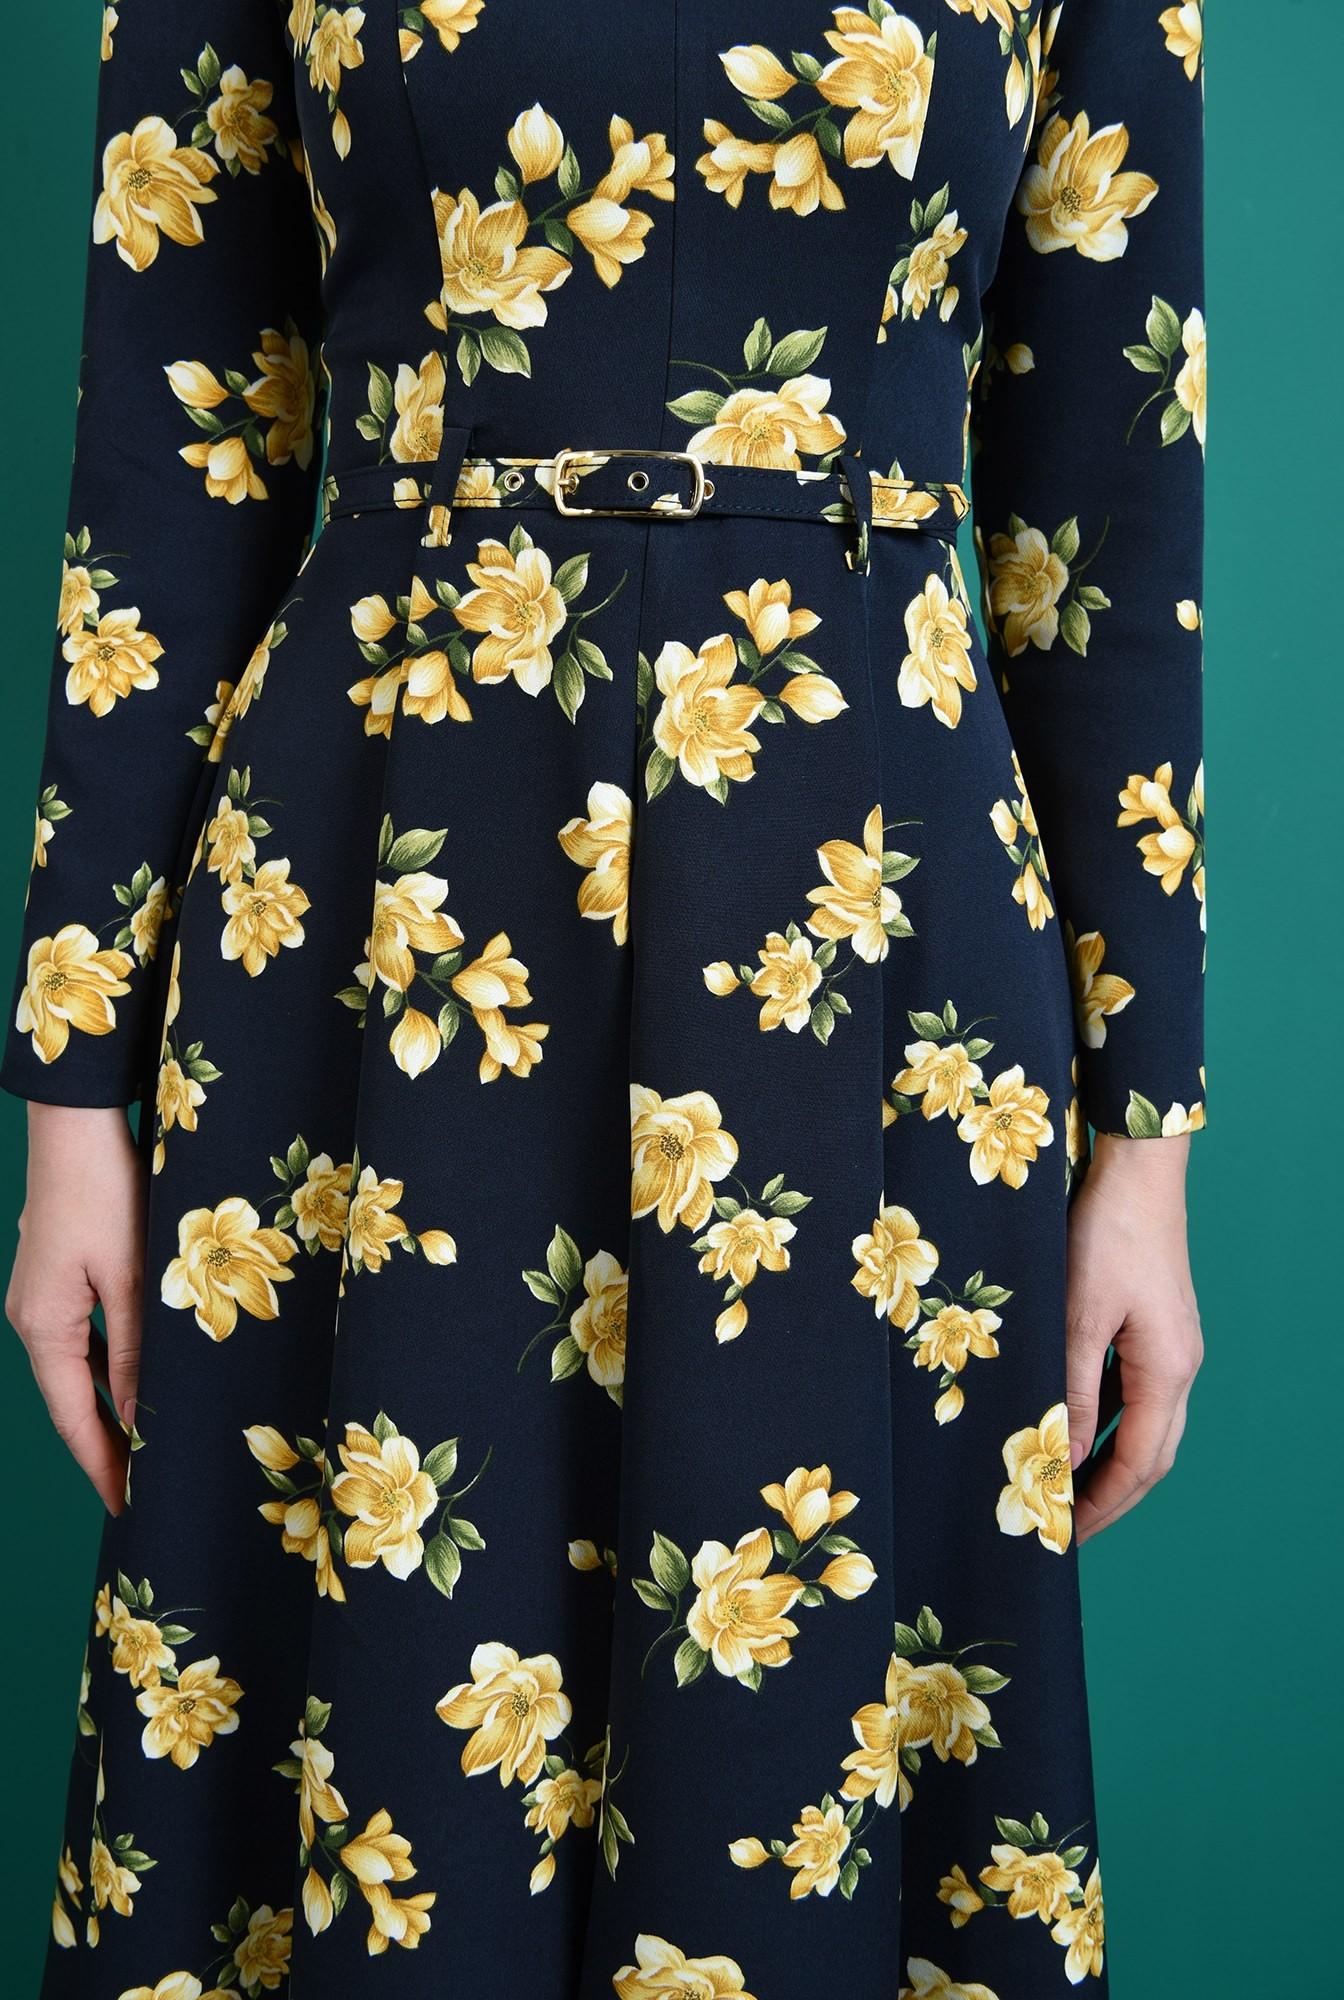 2 - rochie bleumarin, evazata, cu mptive florale